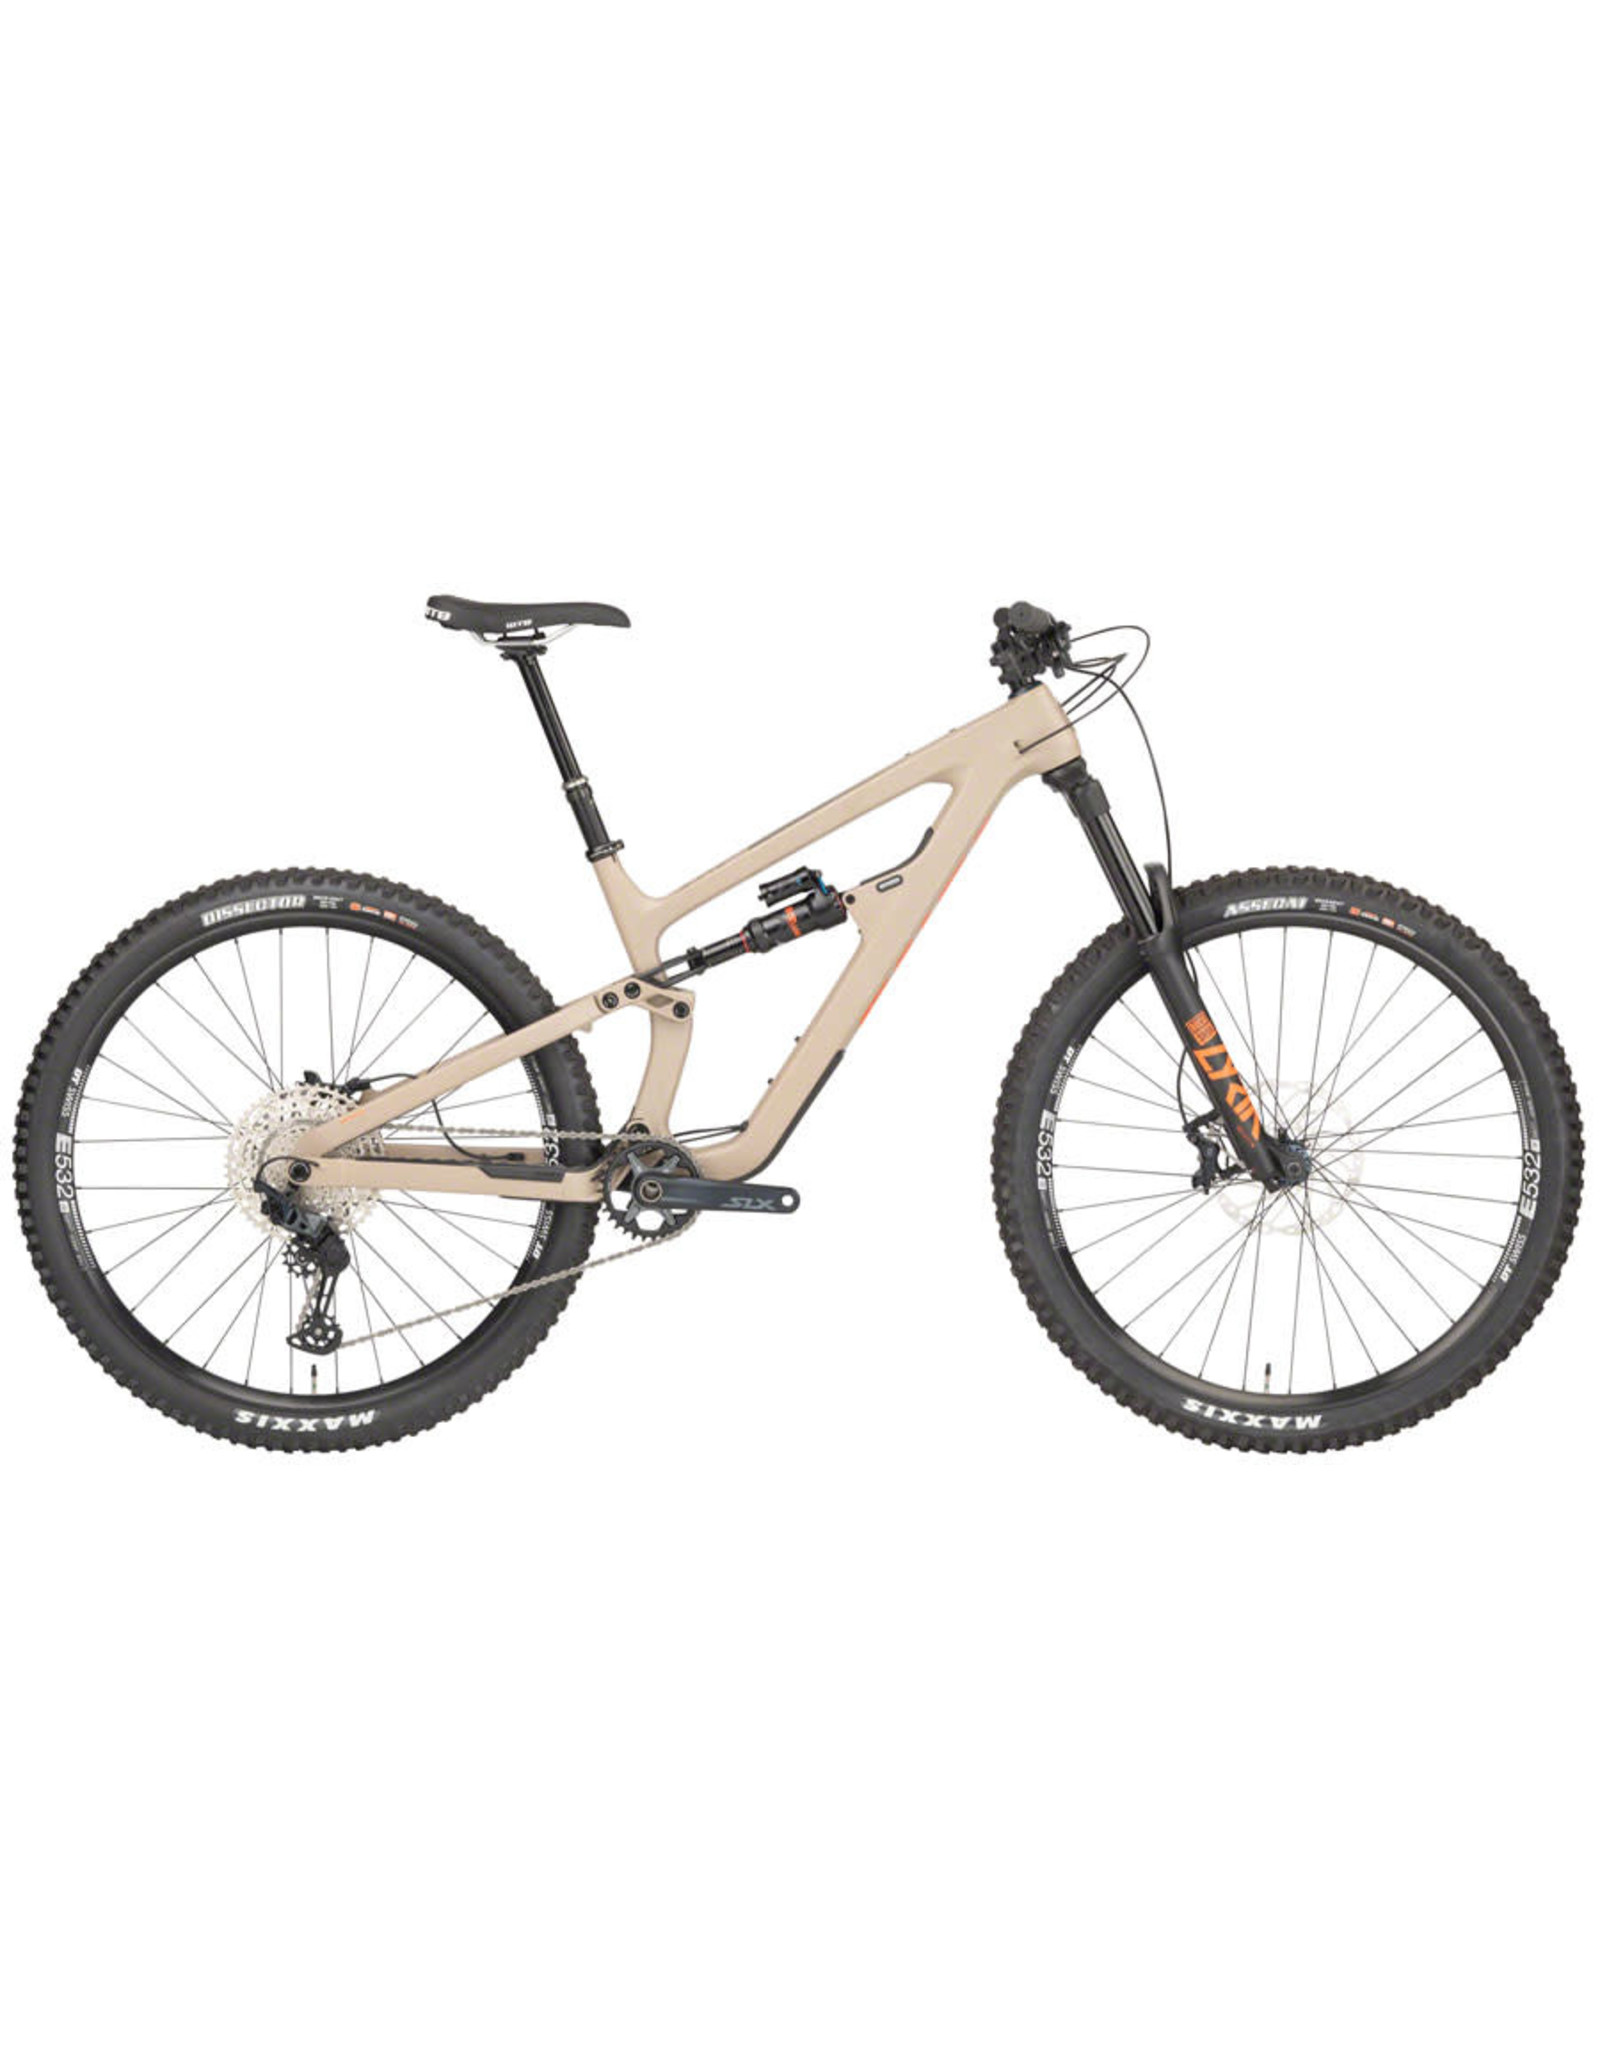 "Salsa Salsa Blackthorn Carbon SLX Bike - 29"", Carbon, Tan"